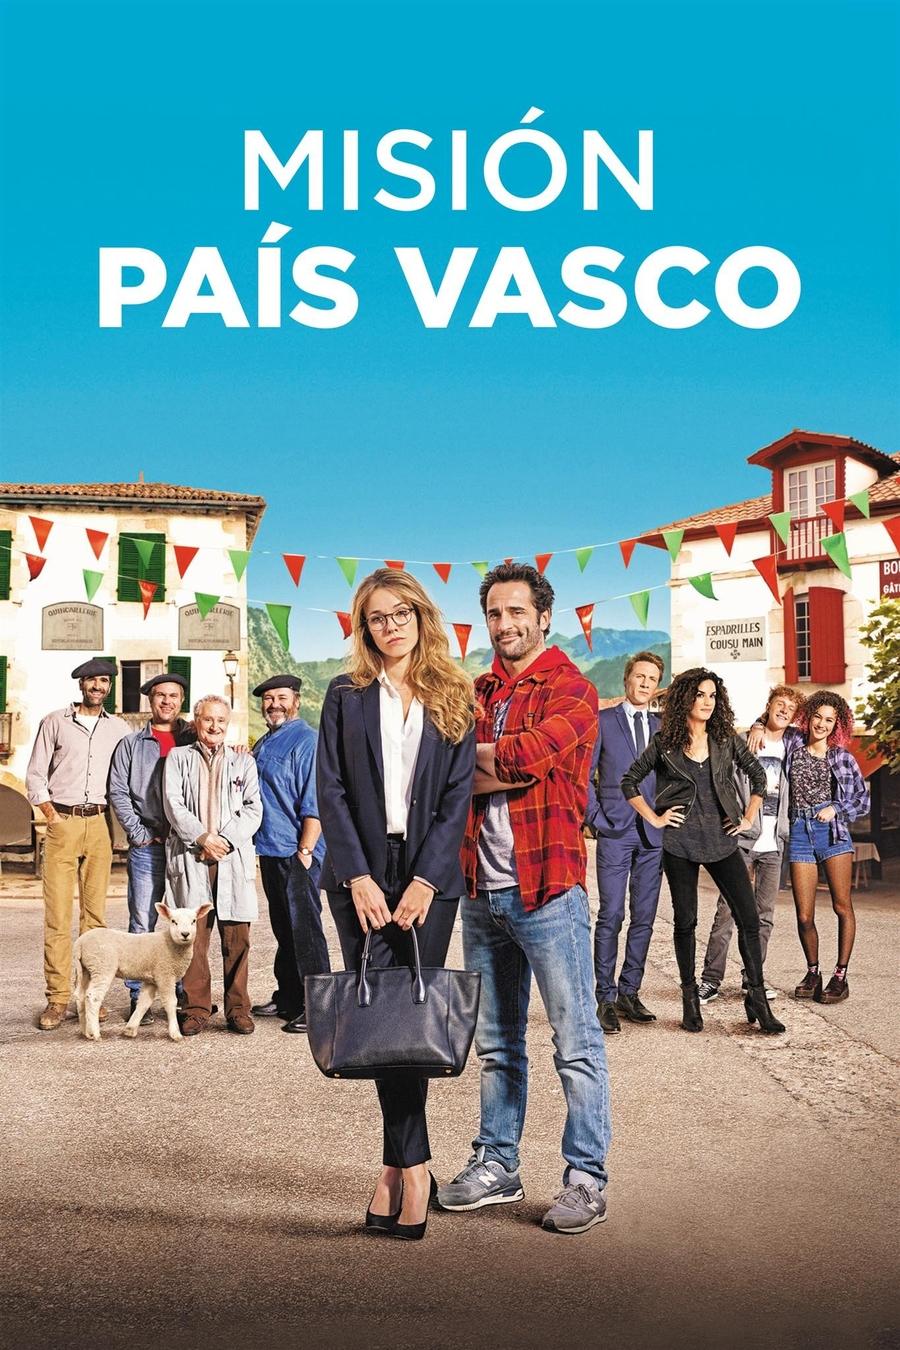 Misión País Vasco